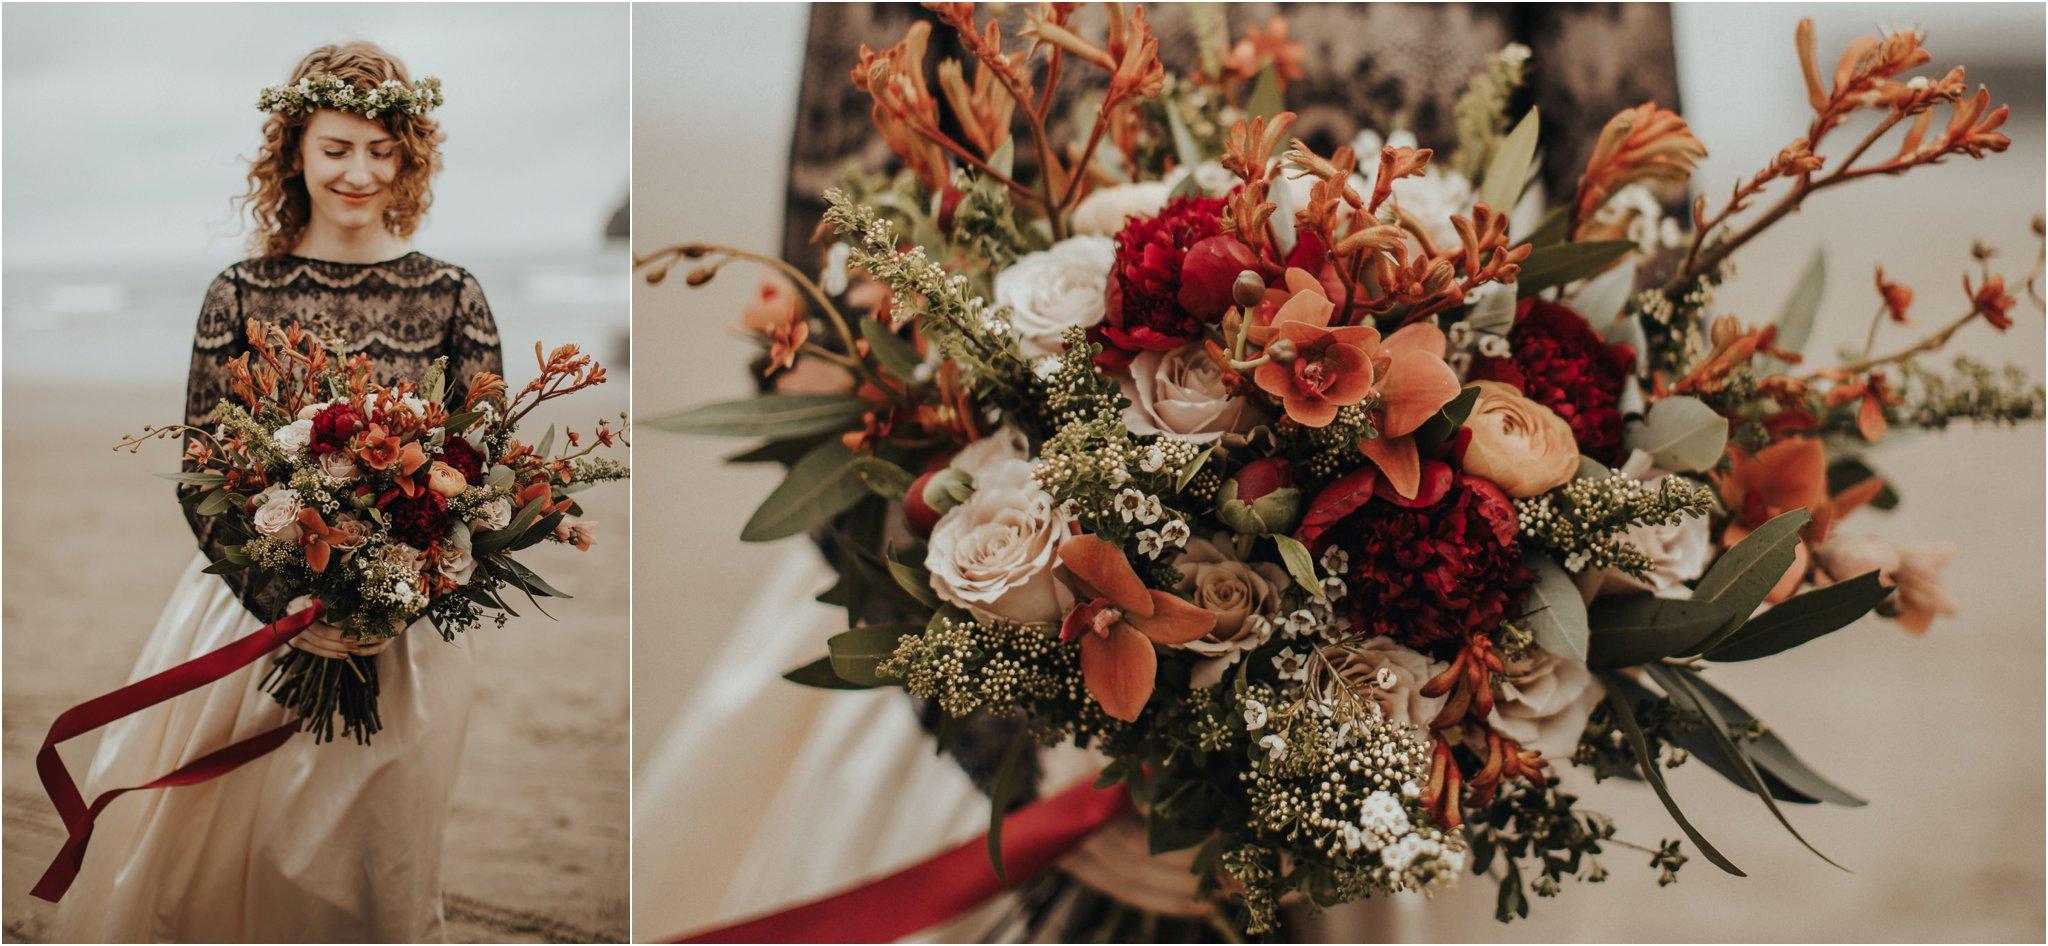 Cape Kiwanda - Elopement - Oregon - Wedding Photographer - Pat Cori Photography - 02.jpg